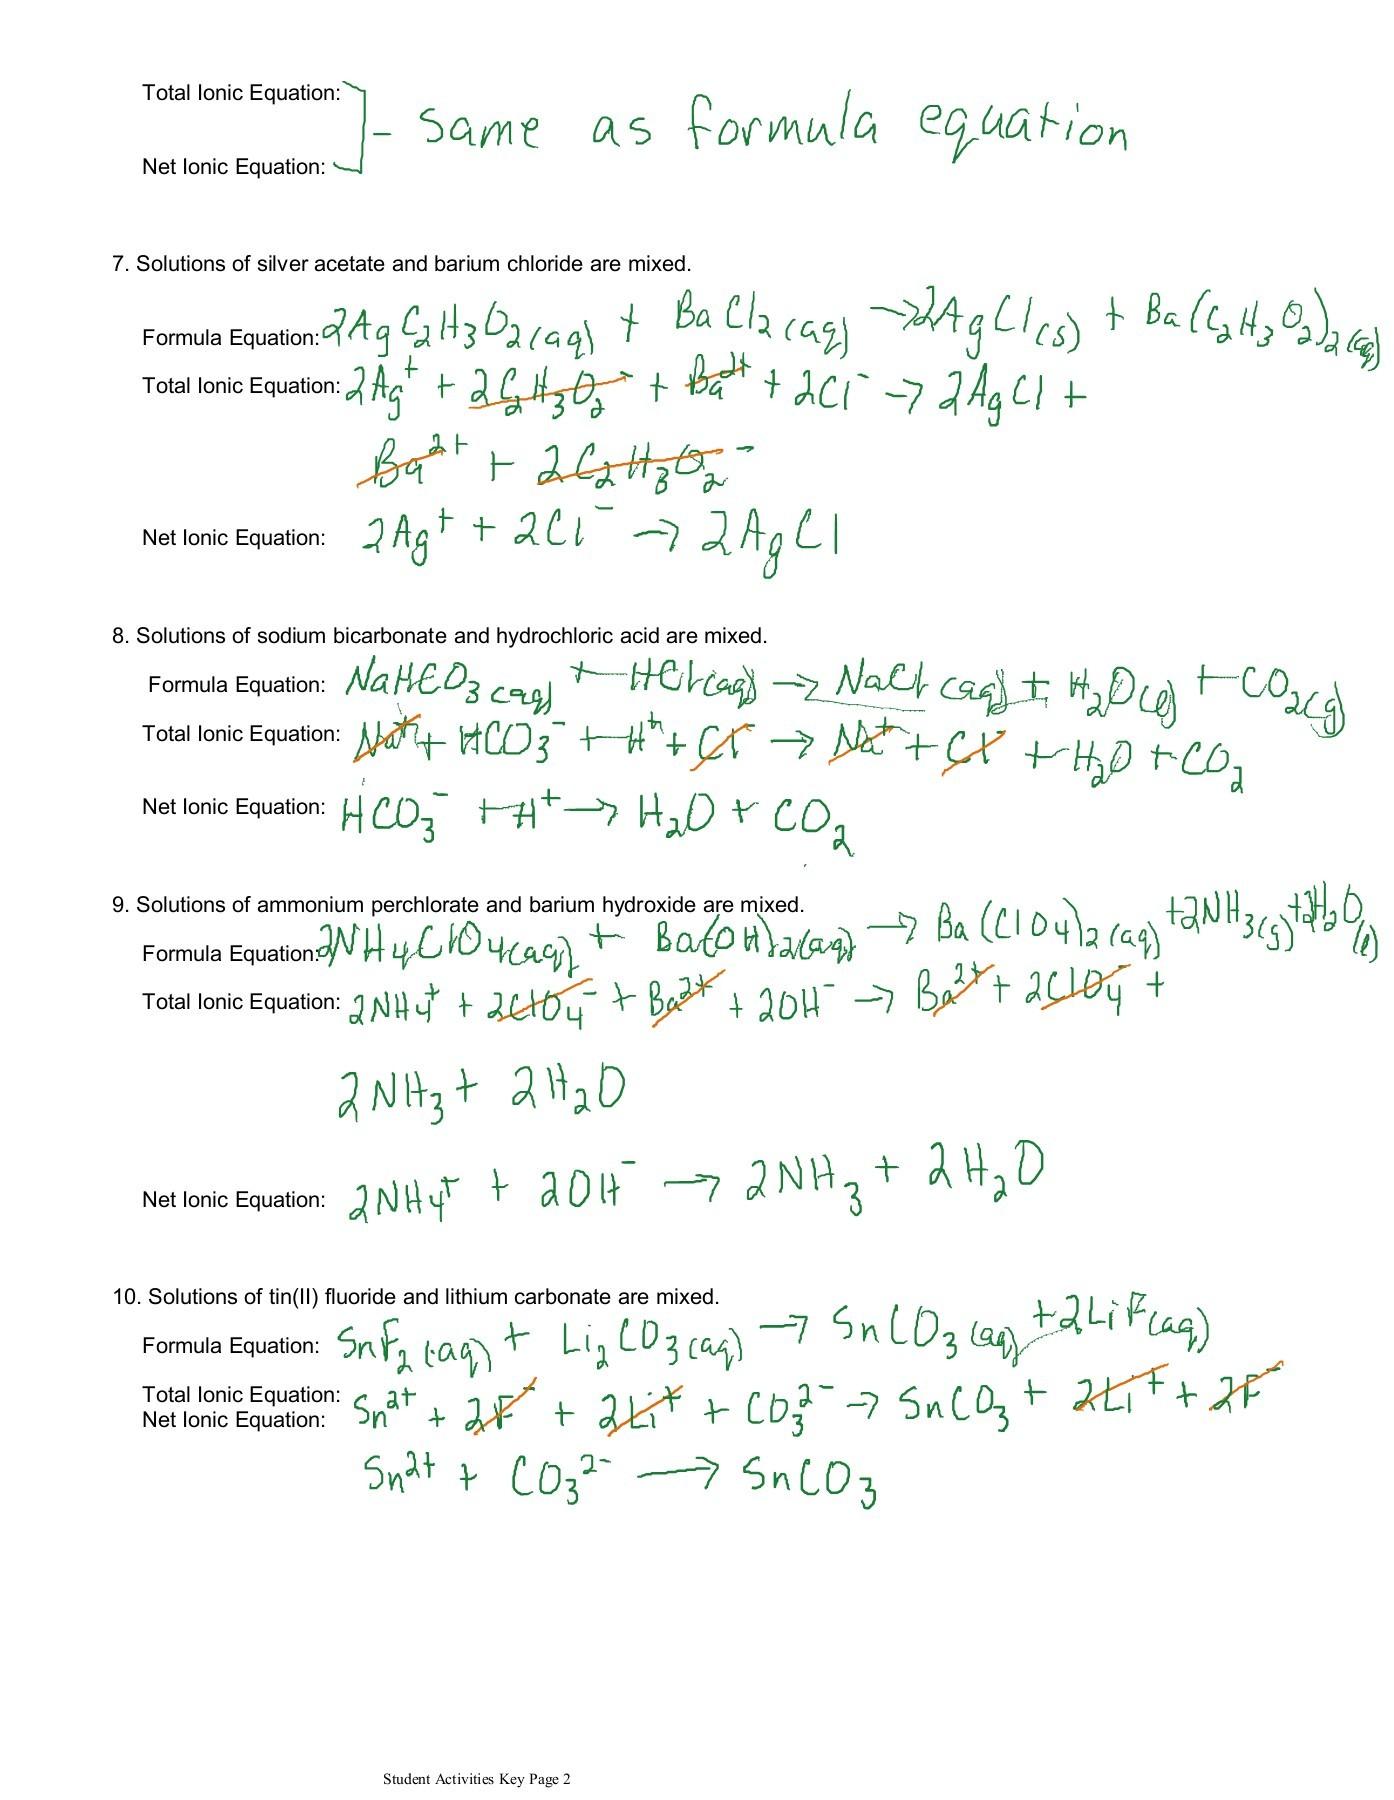 Formula Equation For Sodium Hydroxide With Hydrochloric Acid